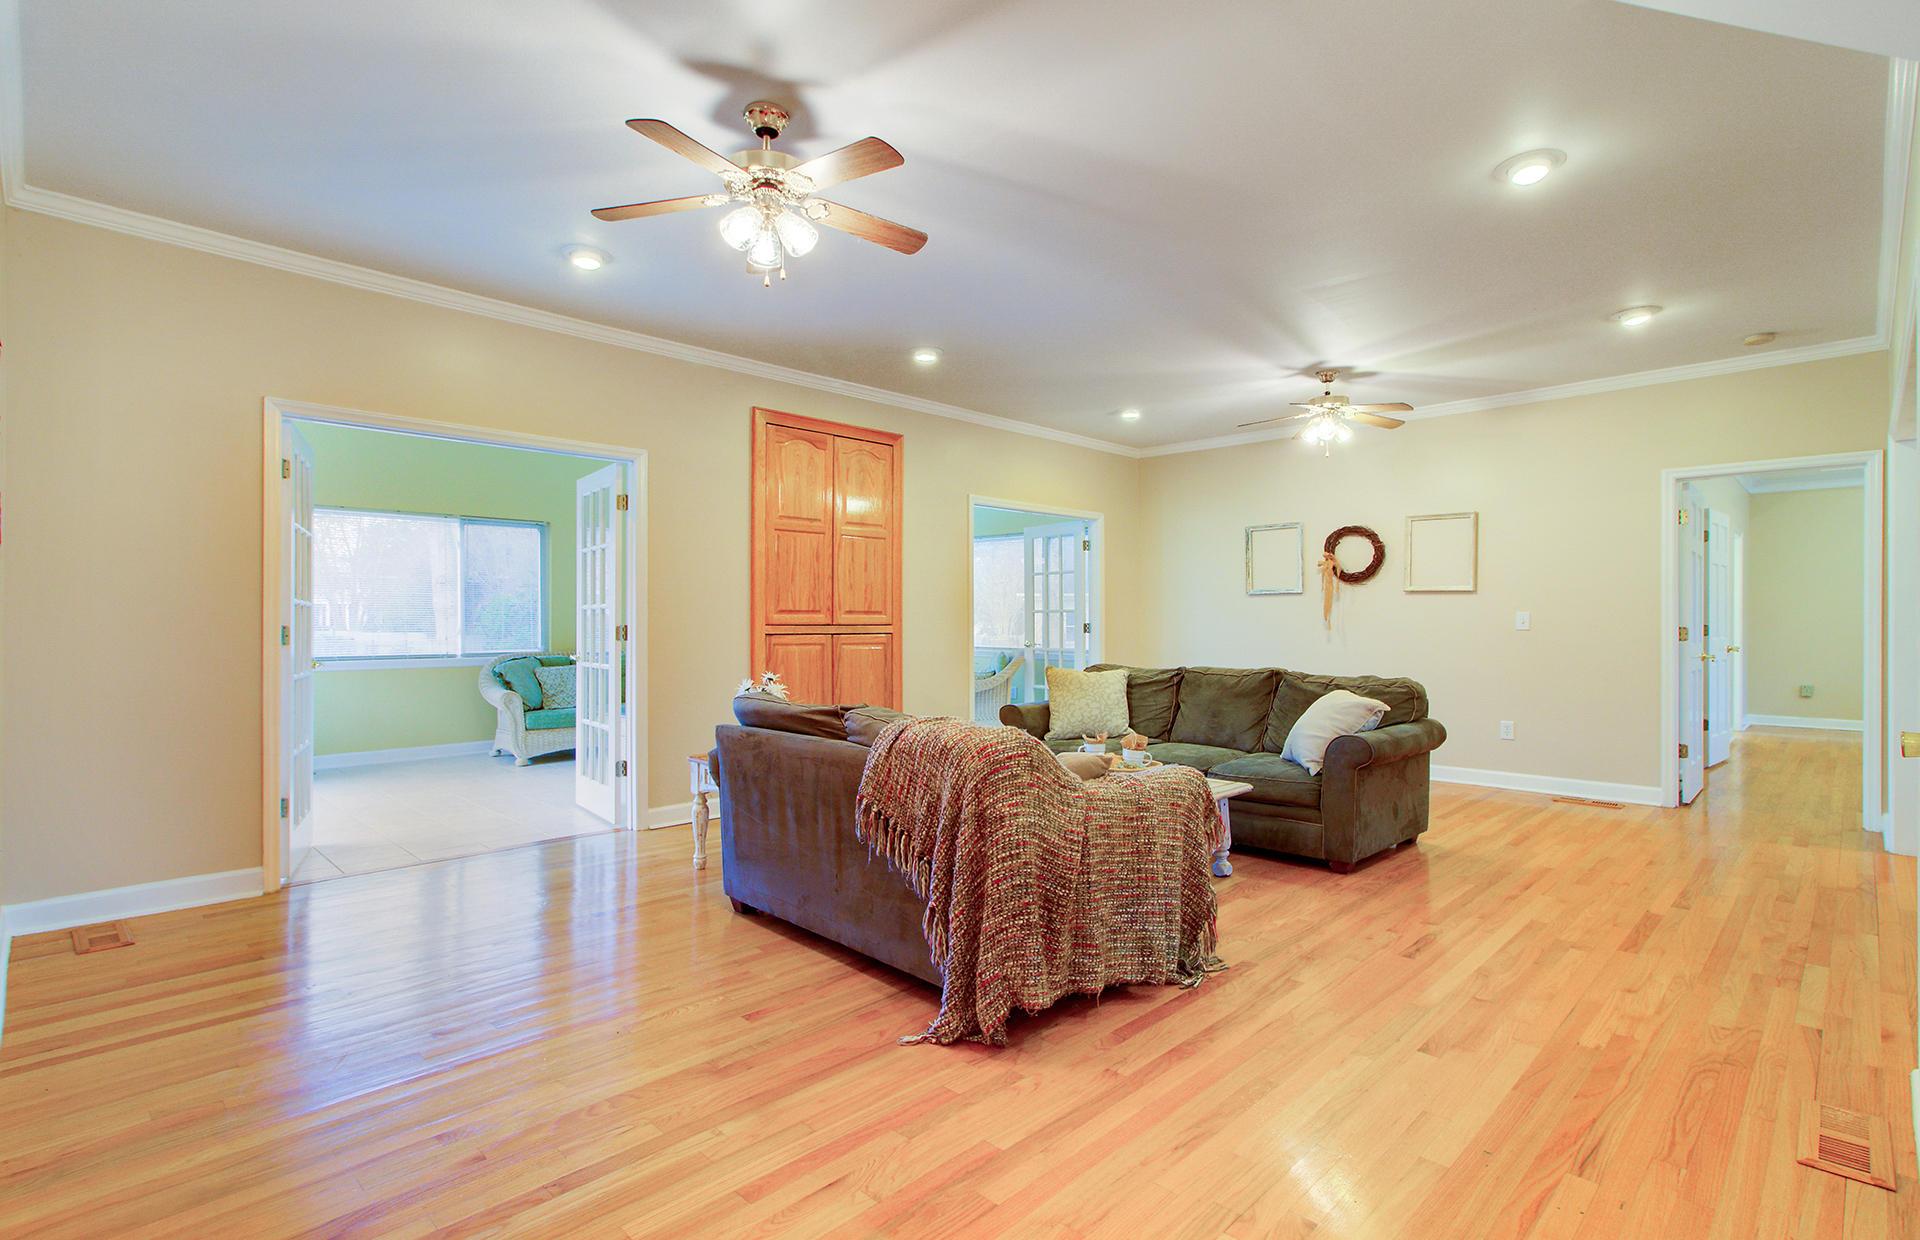 Bakers Landing Homes For Sale - 105 River Oak, North Charleston, SC - 24